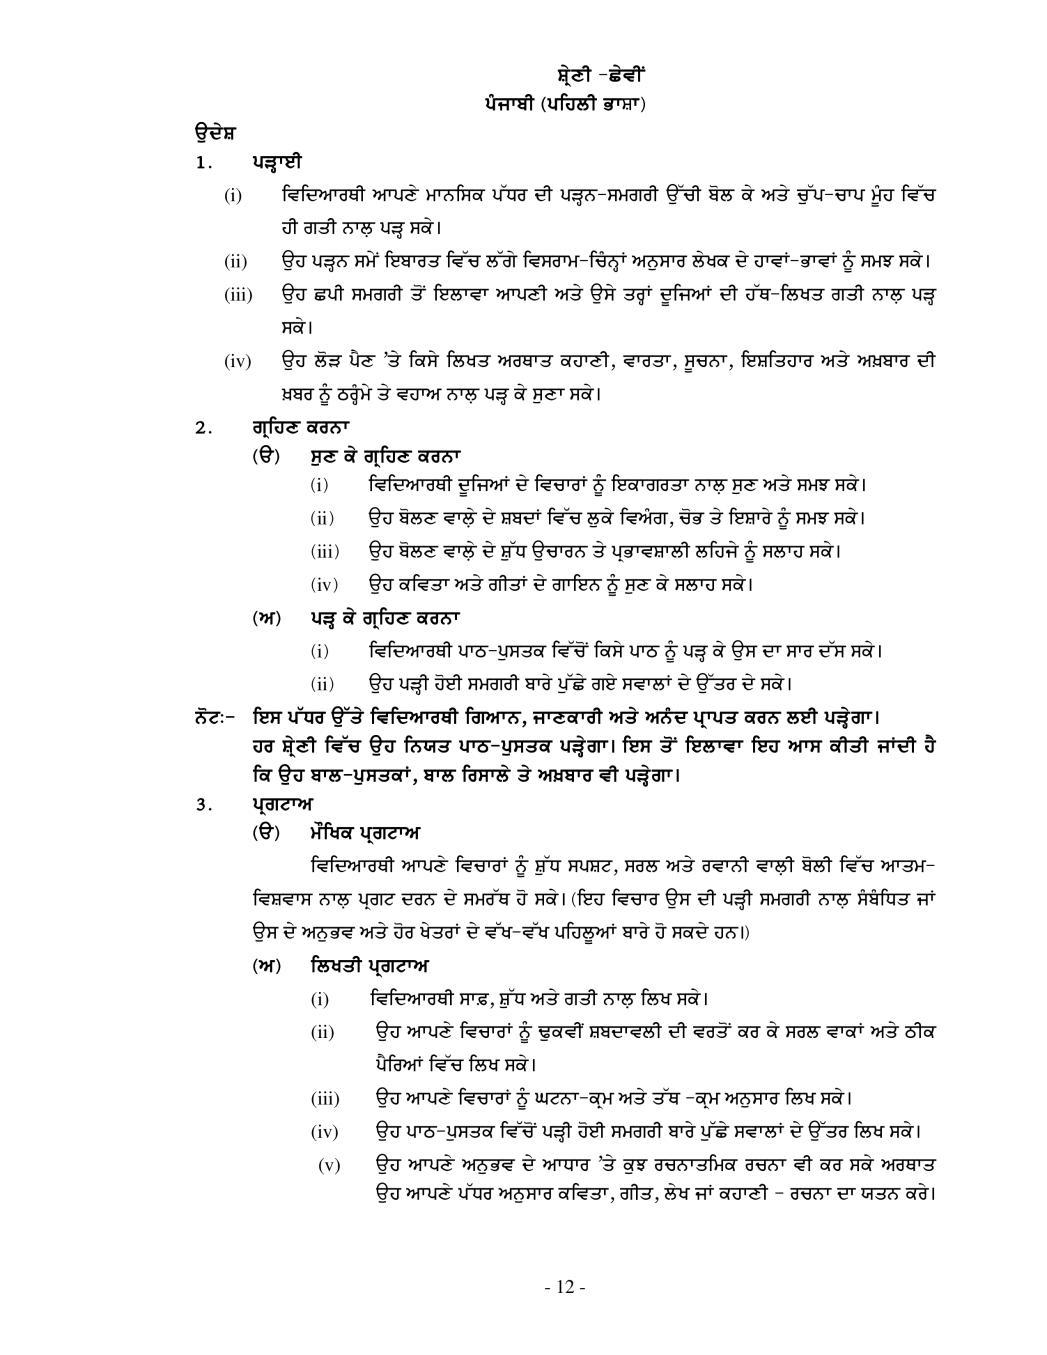 PSEB Syllabus 2020-21 for Class 6 Punjabi - Page 1